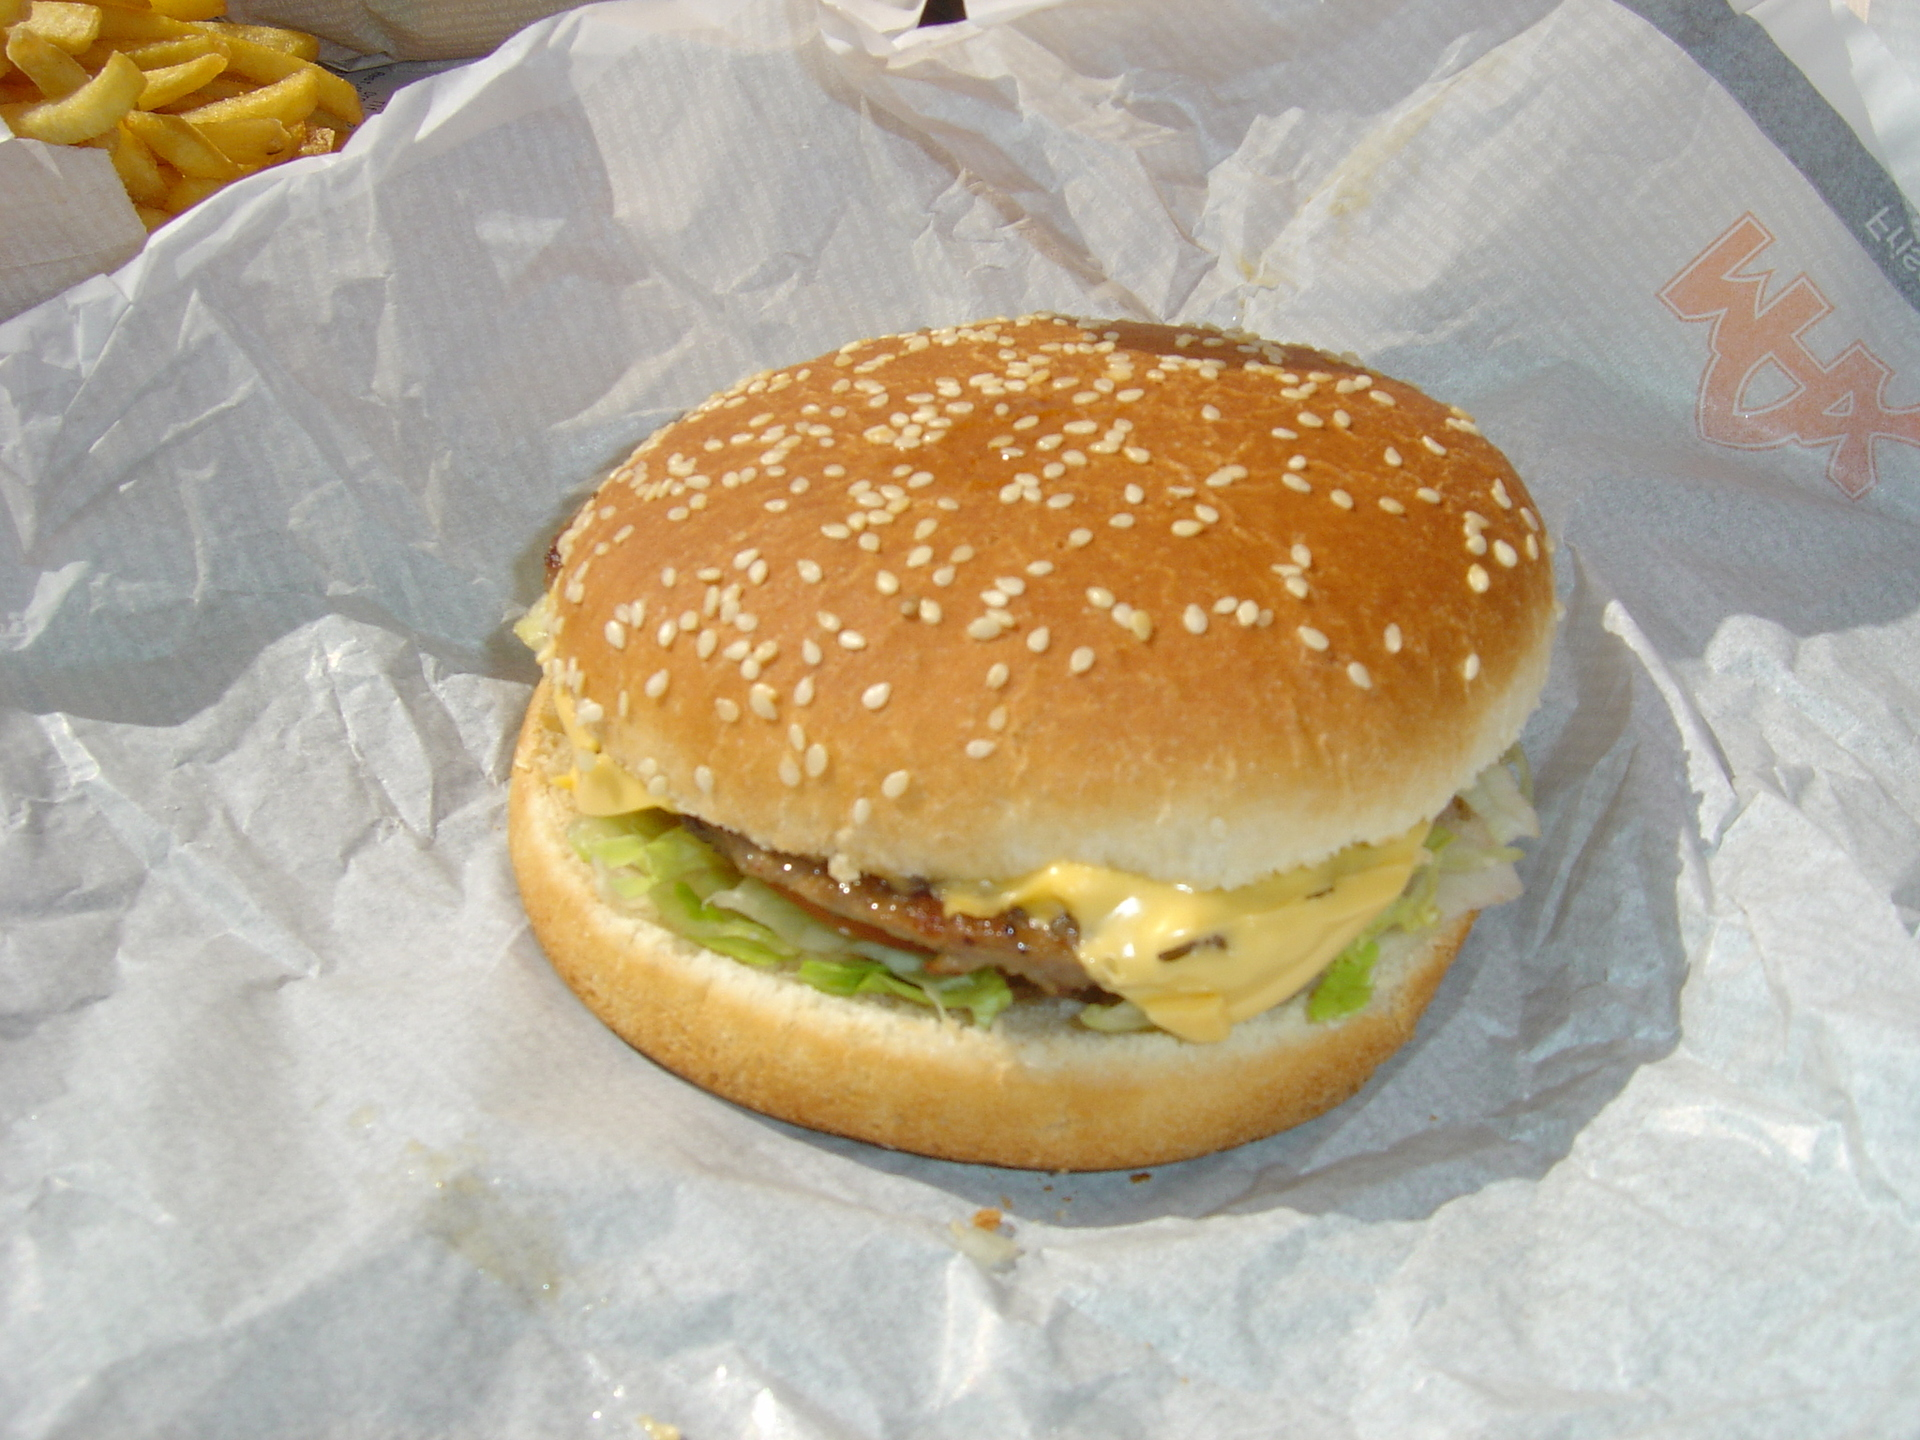 plain boring burger